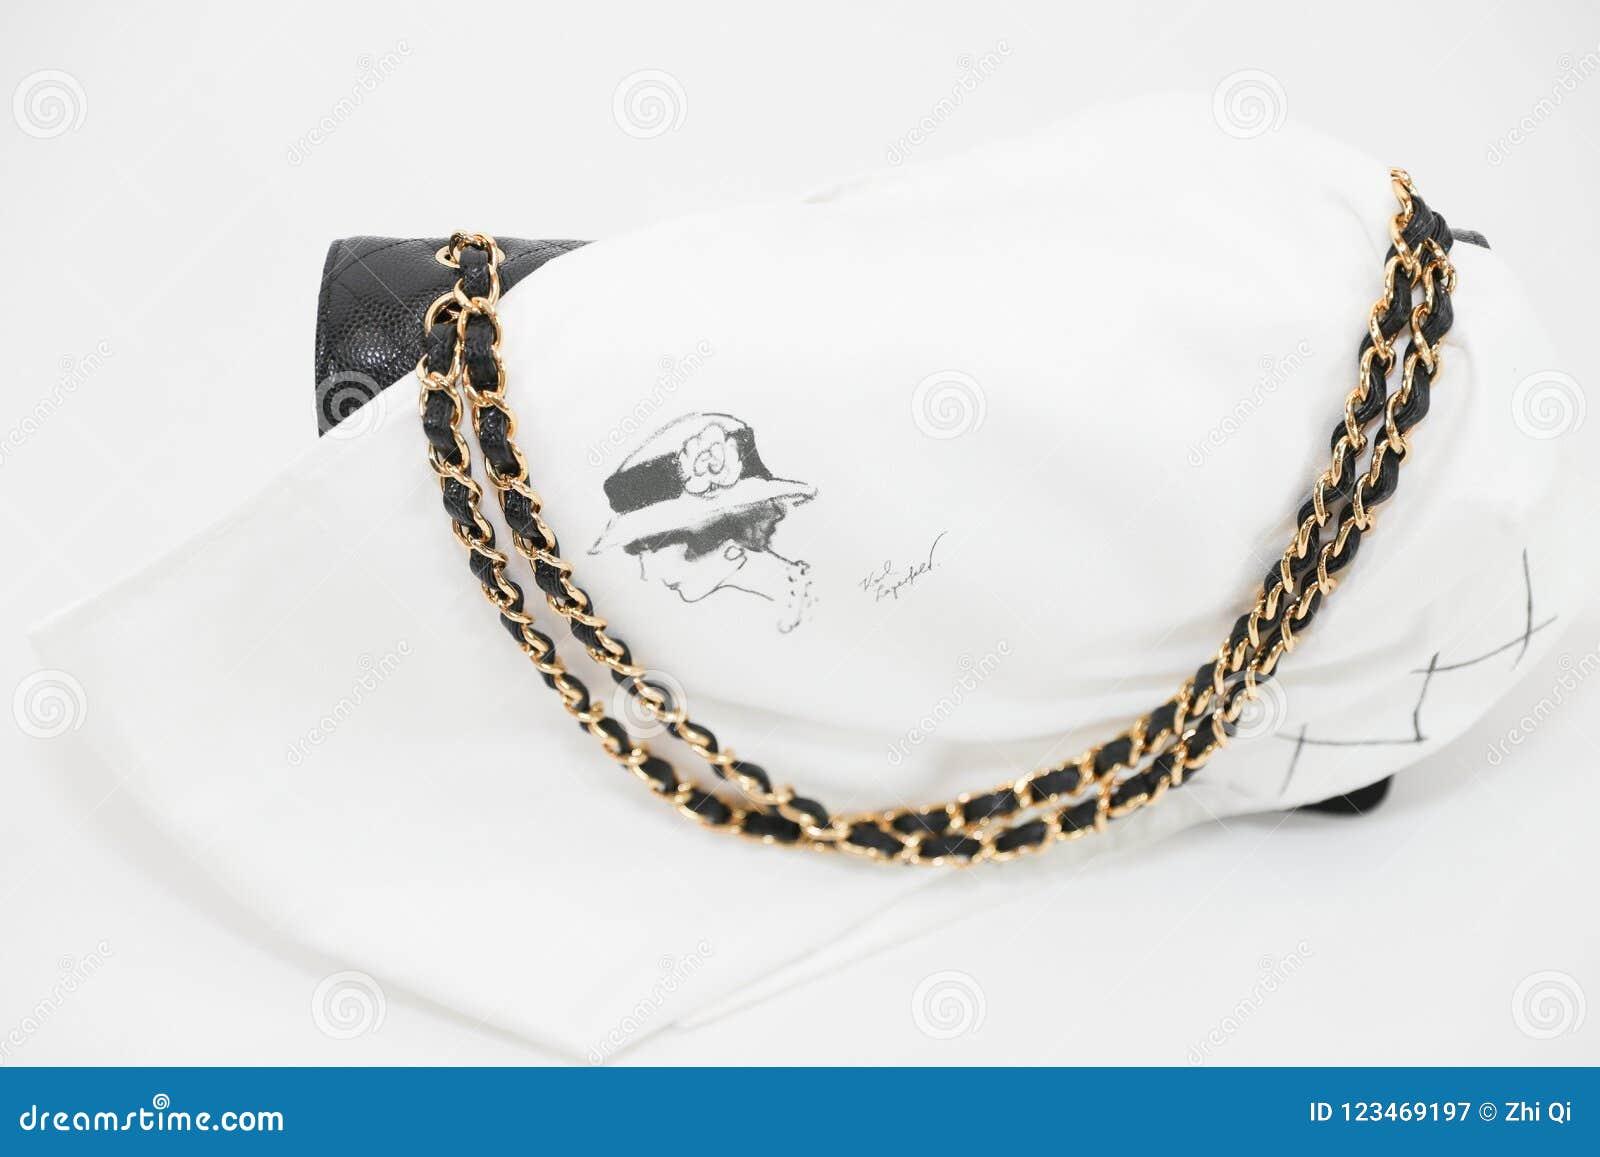 7586b94b10e7 Philadelphia, Pennsylvania, USA, August 10, 2018: Photo of black Chanel  handbag with Chanel dust bag brand Editorial on white background.